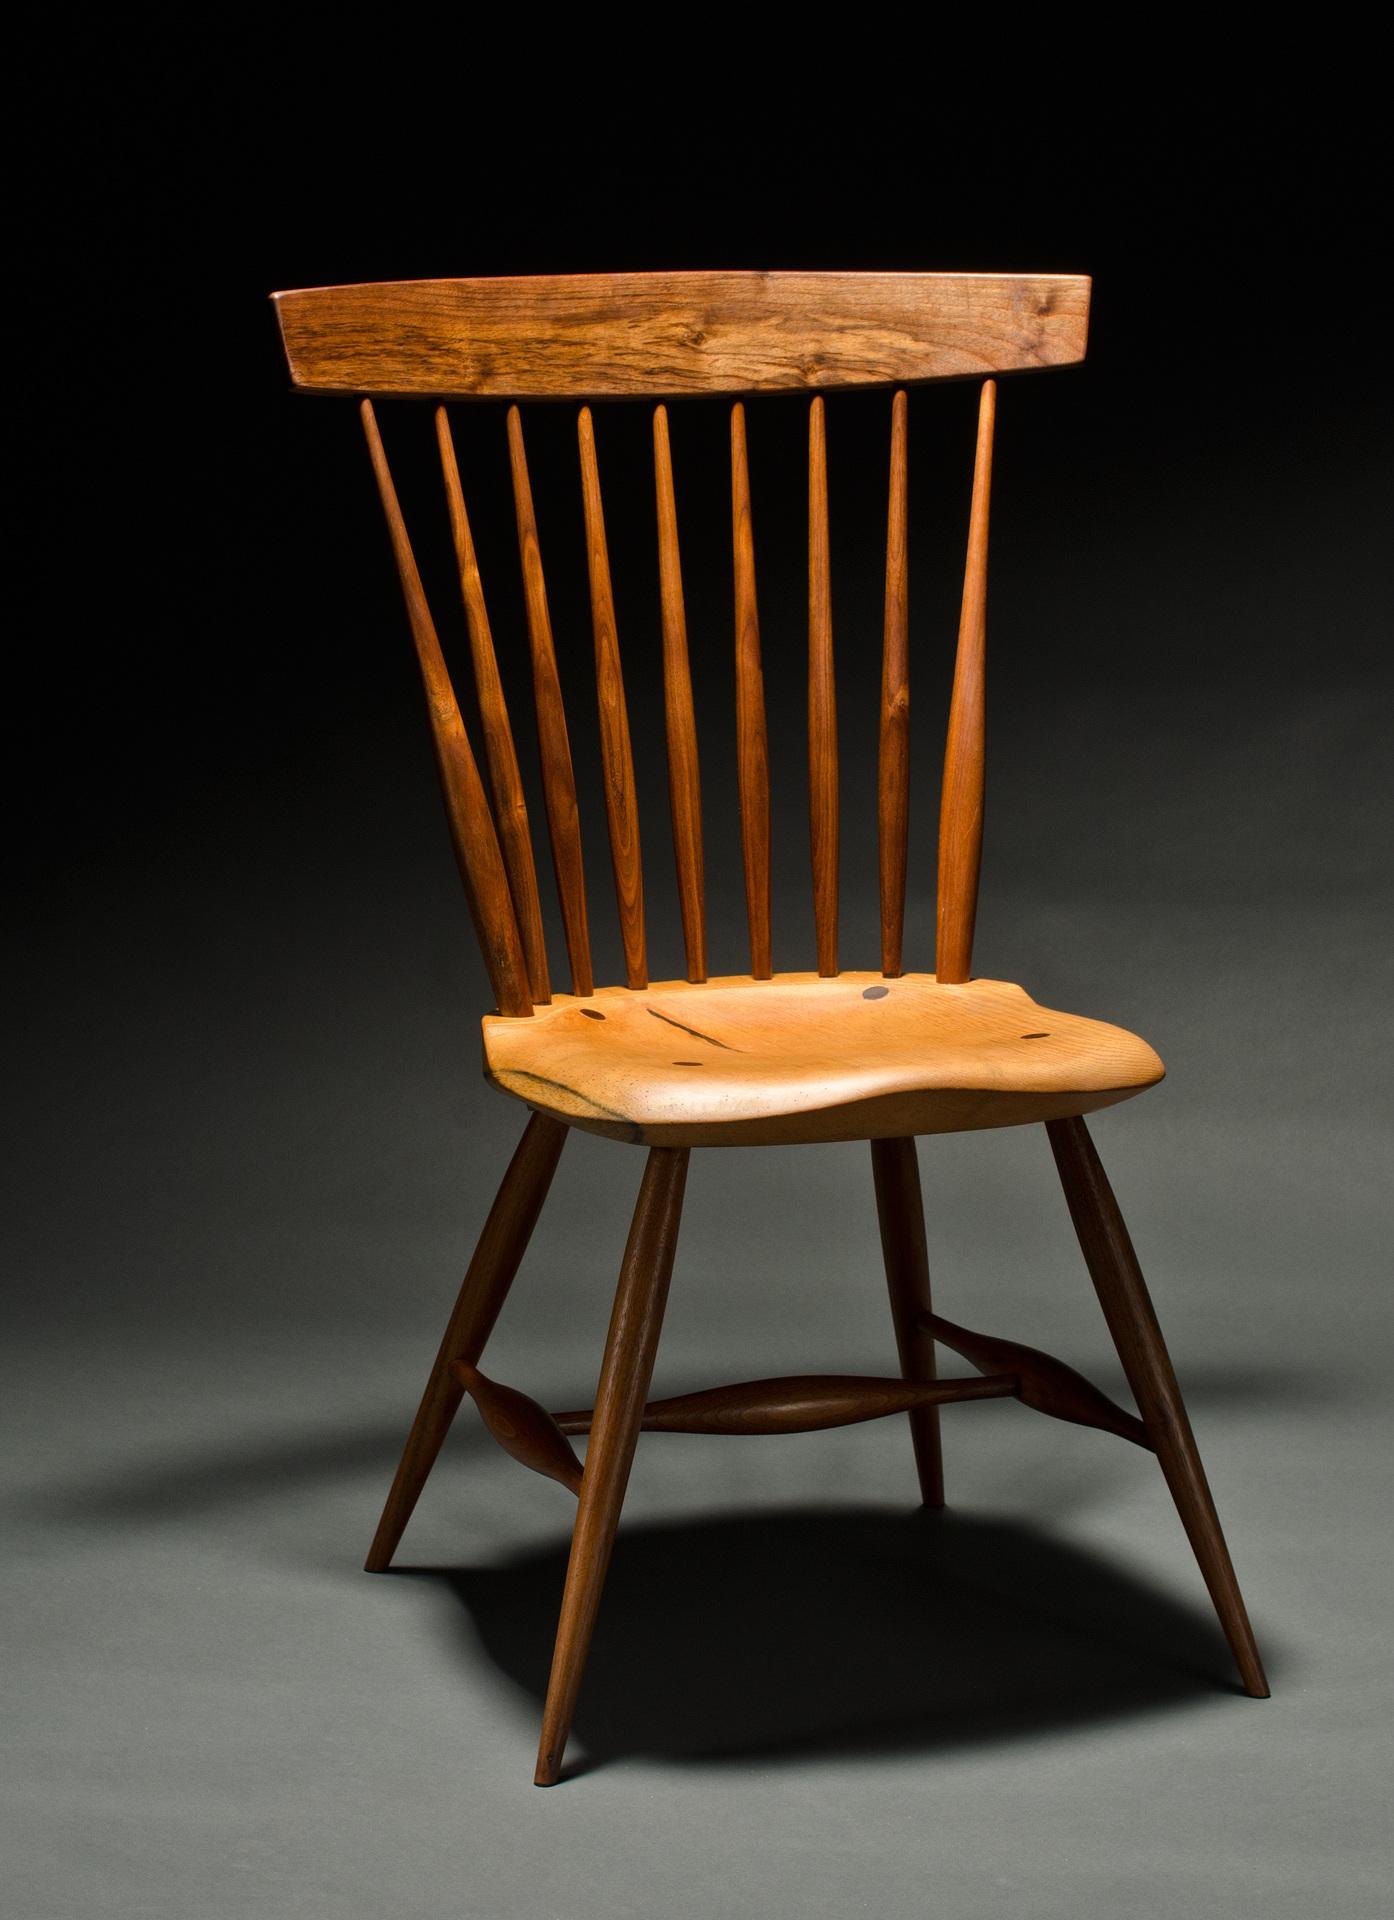 Windsor chair by Steve Habersetzer